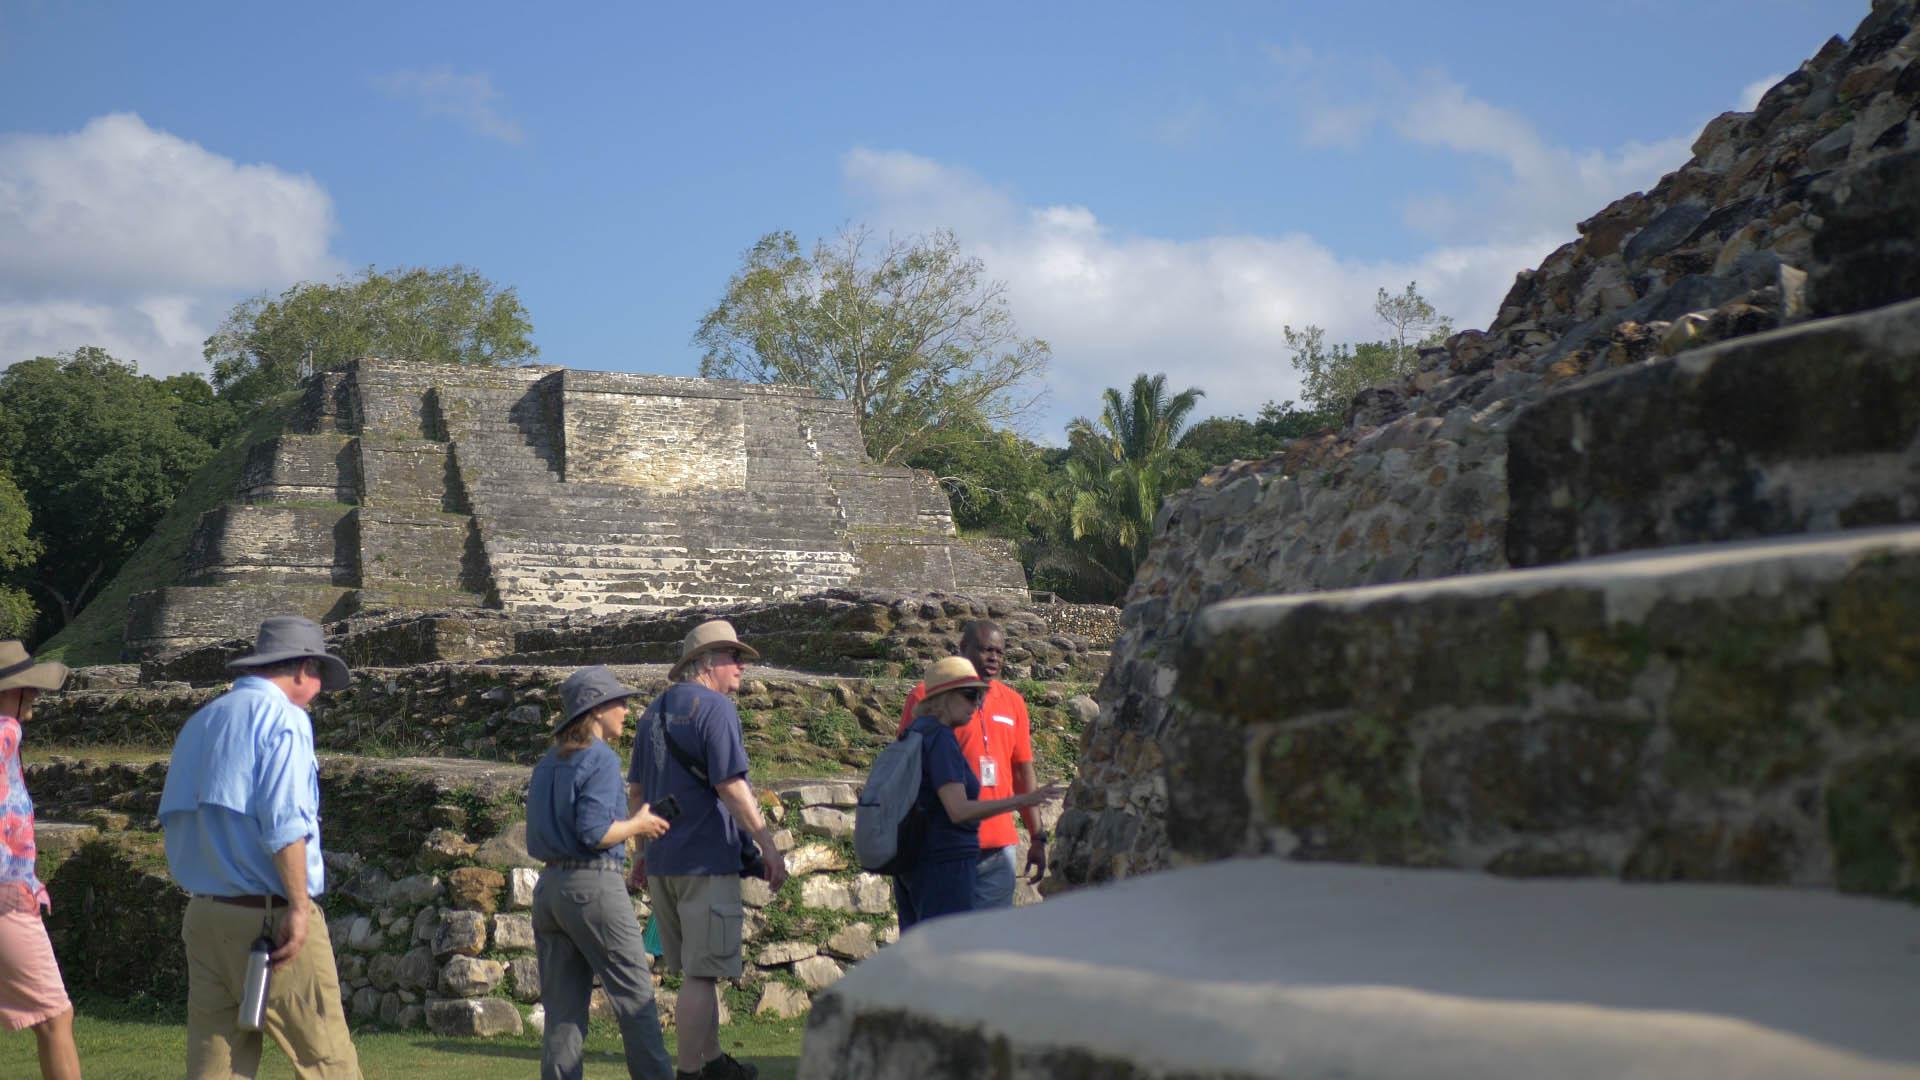 Guests walk through Mayan Ruins in Belize